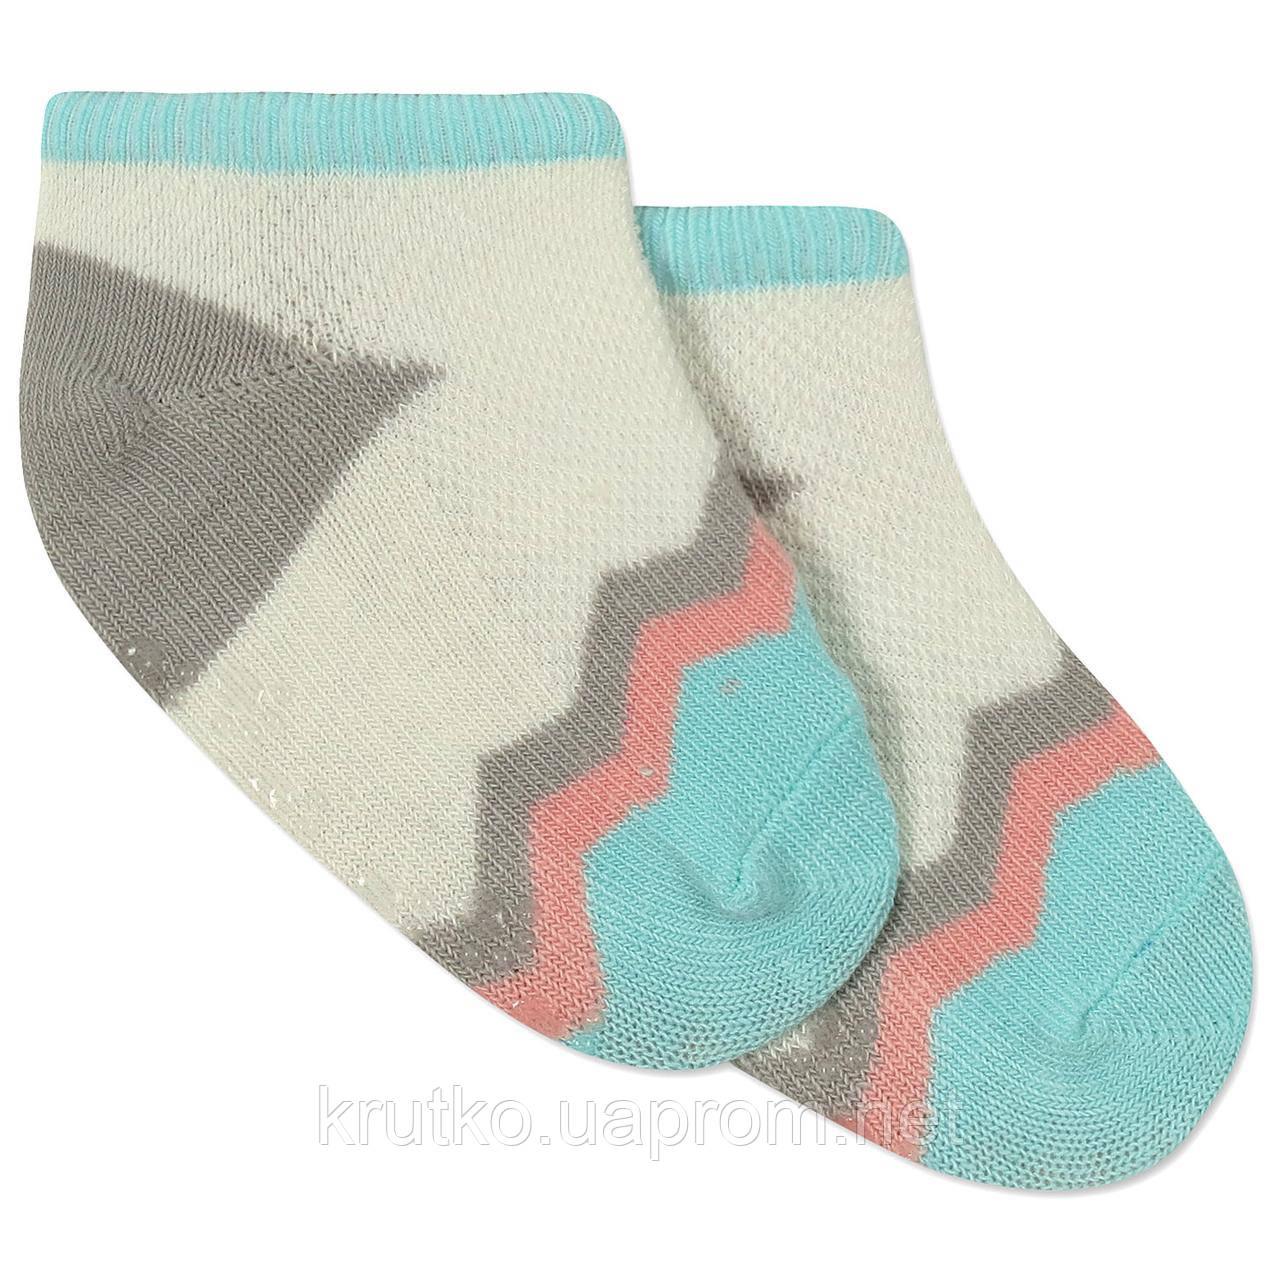 Детские антискользящие носки Зигзаг Berni